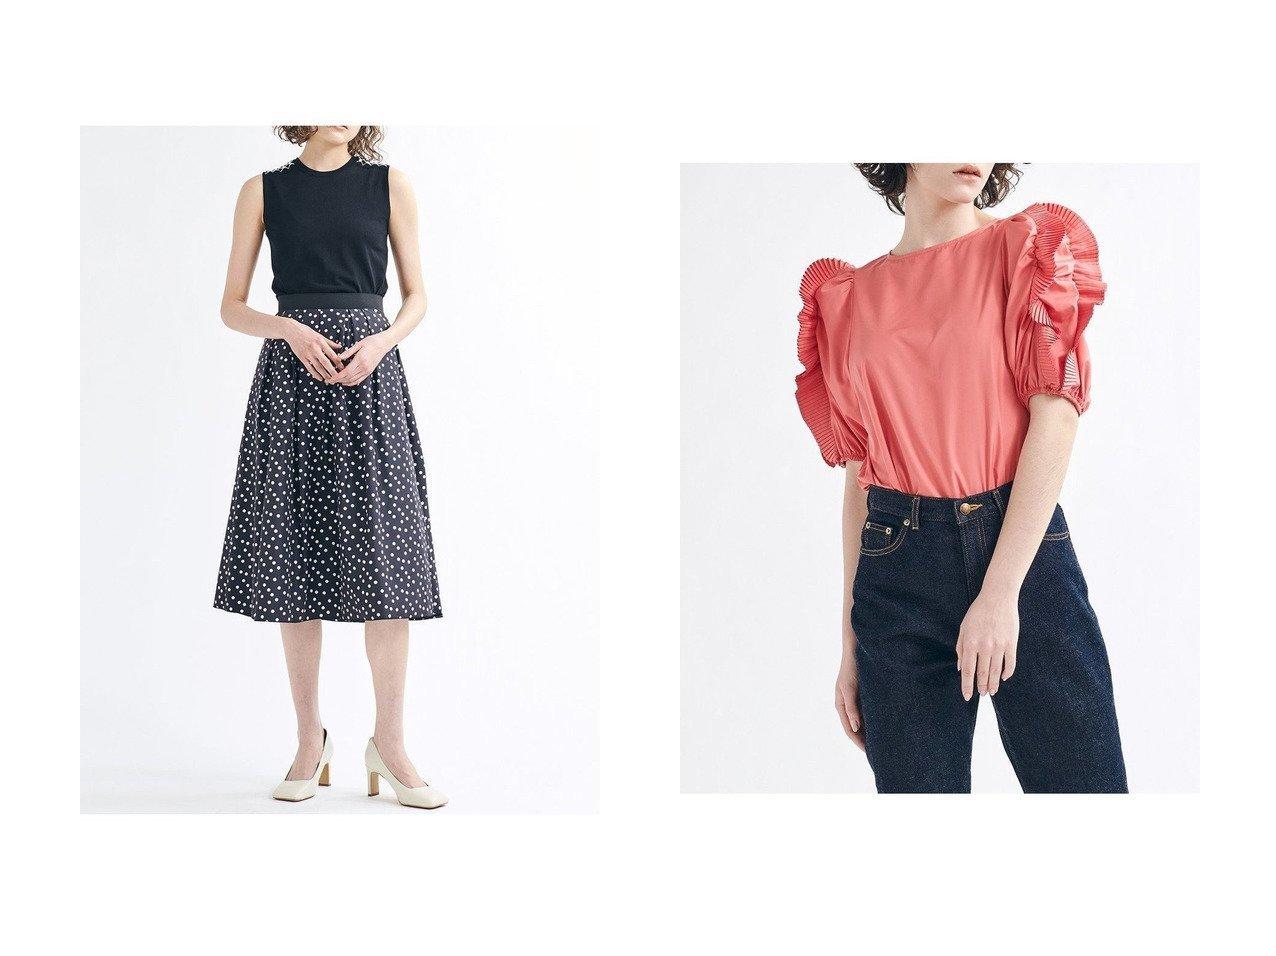 【LANVIN en Bleu/ランバン オン ブルー】のプリーツフリルブラウス&パールショルダーノースリーブニット トップス・カットソーのおすすめ!人気、トレンド・レディースファッションの通販 おすすめで人気の流行・トレンド、ファッションの通販商品 メンズファッション・キッズファッション・インテリア・家具・レディースファッション・服の通販 founy(ファニー) https://founy.com/ ファッション Fashion レディースファッション WOMEN トップス カットソー Tops Tshirt シャツ/ブラウス Shirts Blouses ニット Knit Tops キャミソール / ノースリーブ No Sleeves プルオーバー Pullover 2021年 2021 2021 春夏 S/S SS Spring/Summer 2021 S/S 春夏 SS Spring/Summer おすすめ Recommend コンシャス ショート スリーブ タフタ フリル プリーツ ベーシック 春 Spring インナー クール コンパクト ショルダー ジャケット ノースリーブ パール フォルム ラウンド |ID:crp329100000024827